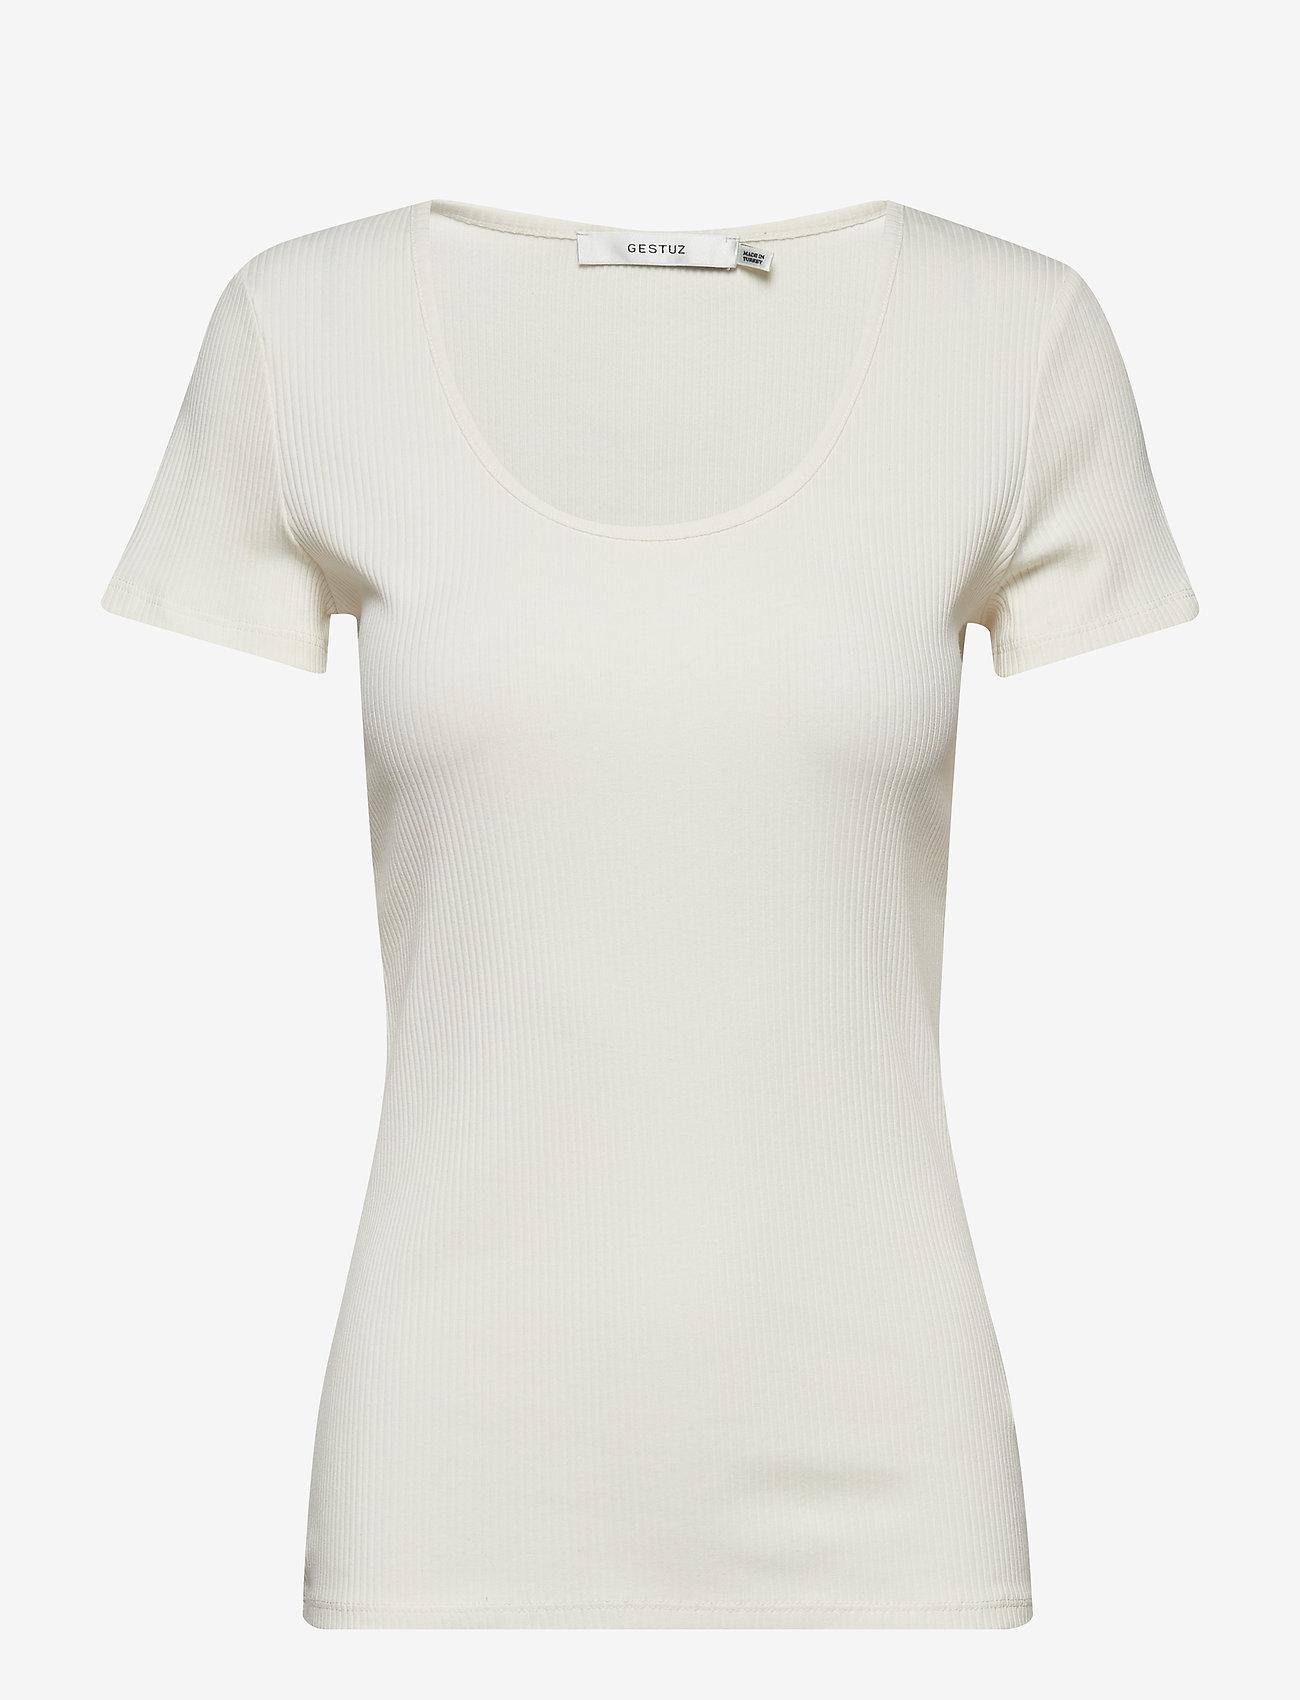 Gestuz - RollaGZ tee NOOS - basic t-shirts - bright white - 0